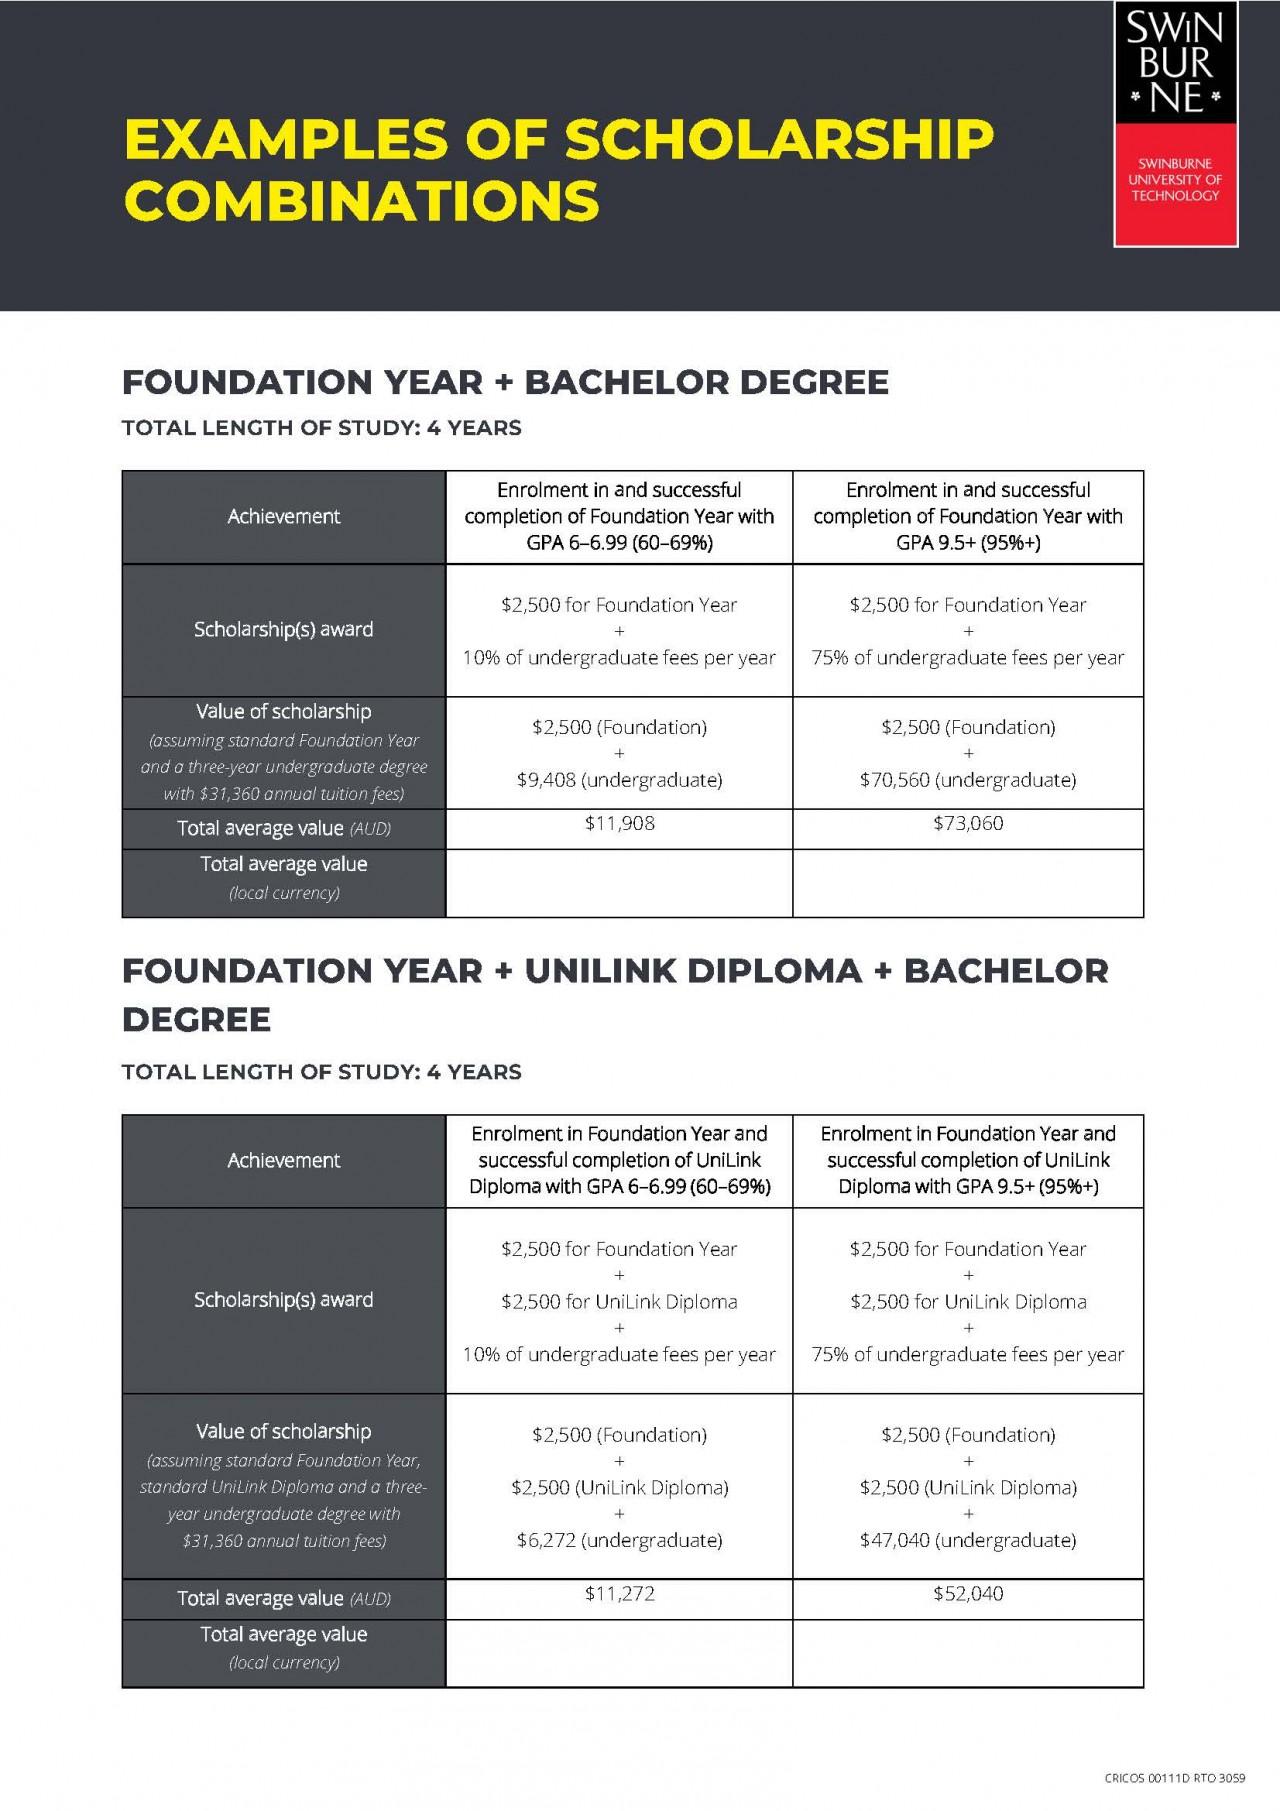 Swinburne IEP Scholarship (1)_Page_3.jpg